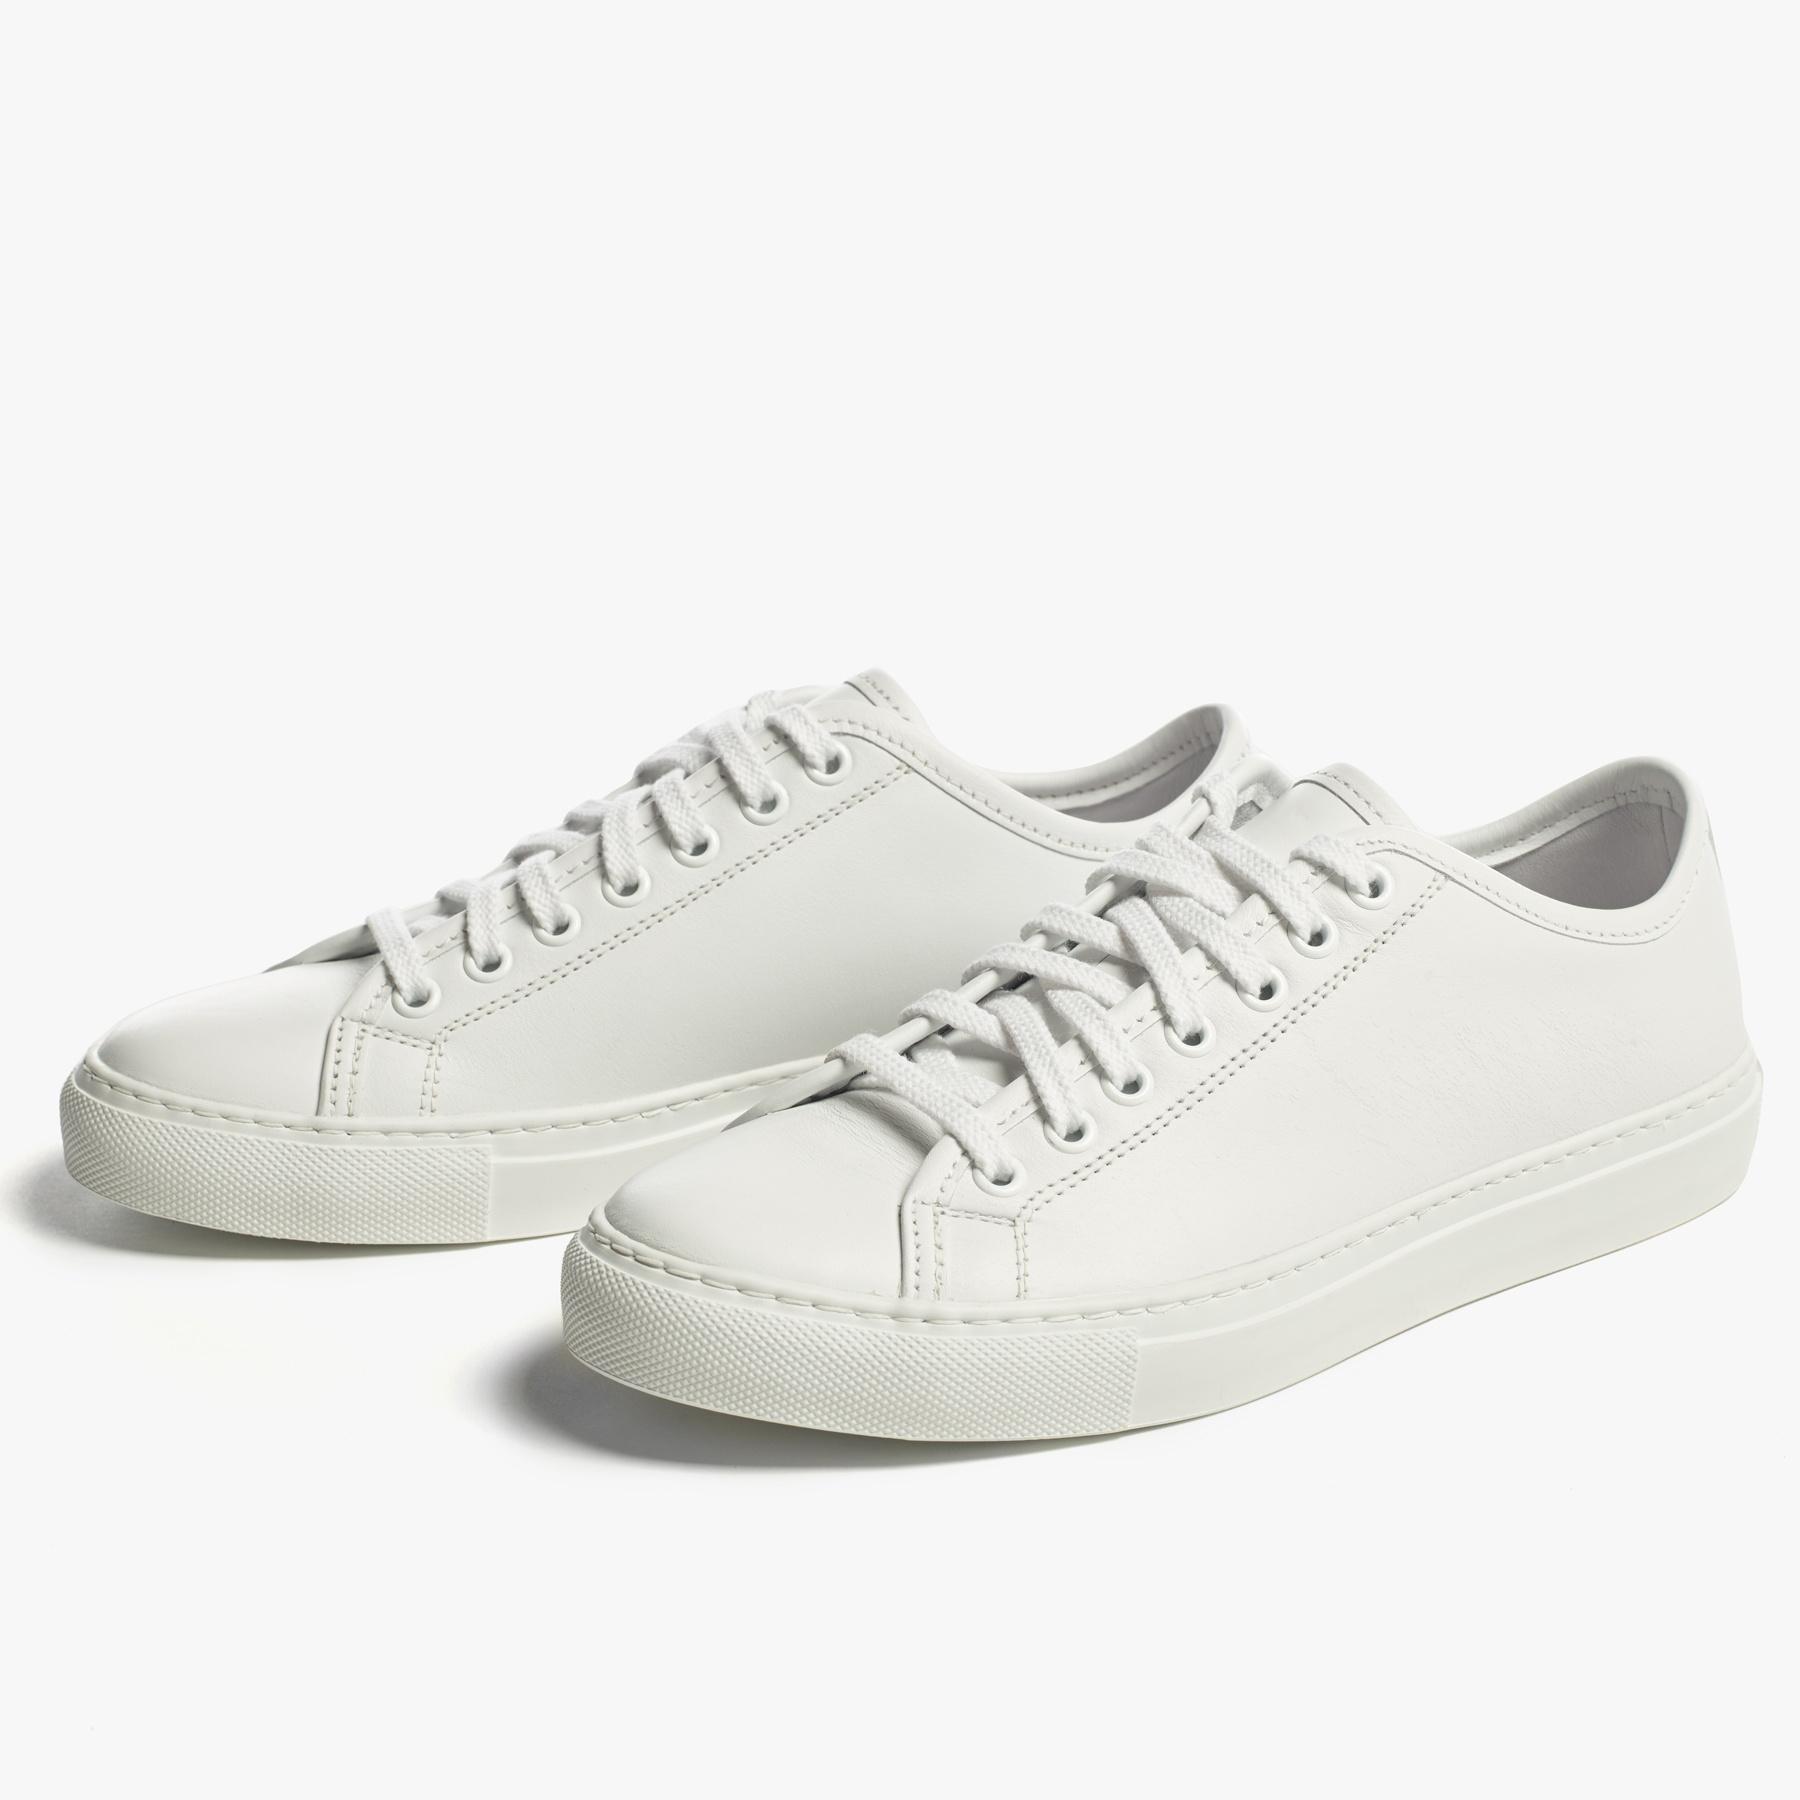 Diemme Veneto Low Sneakers C05VE